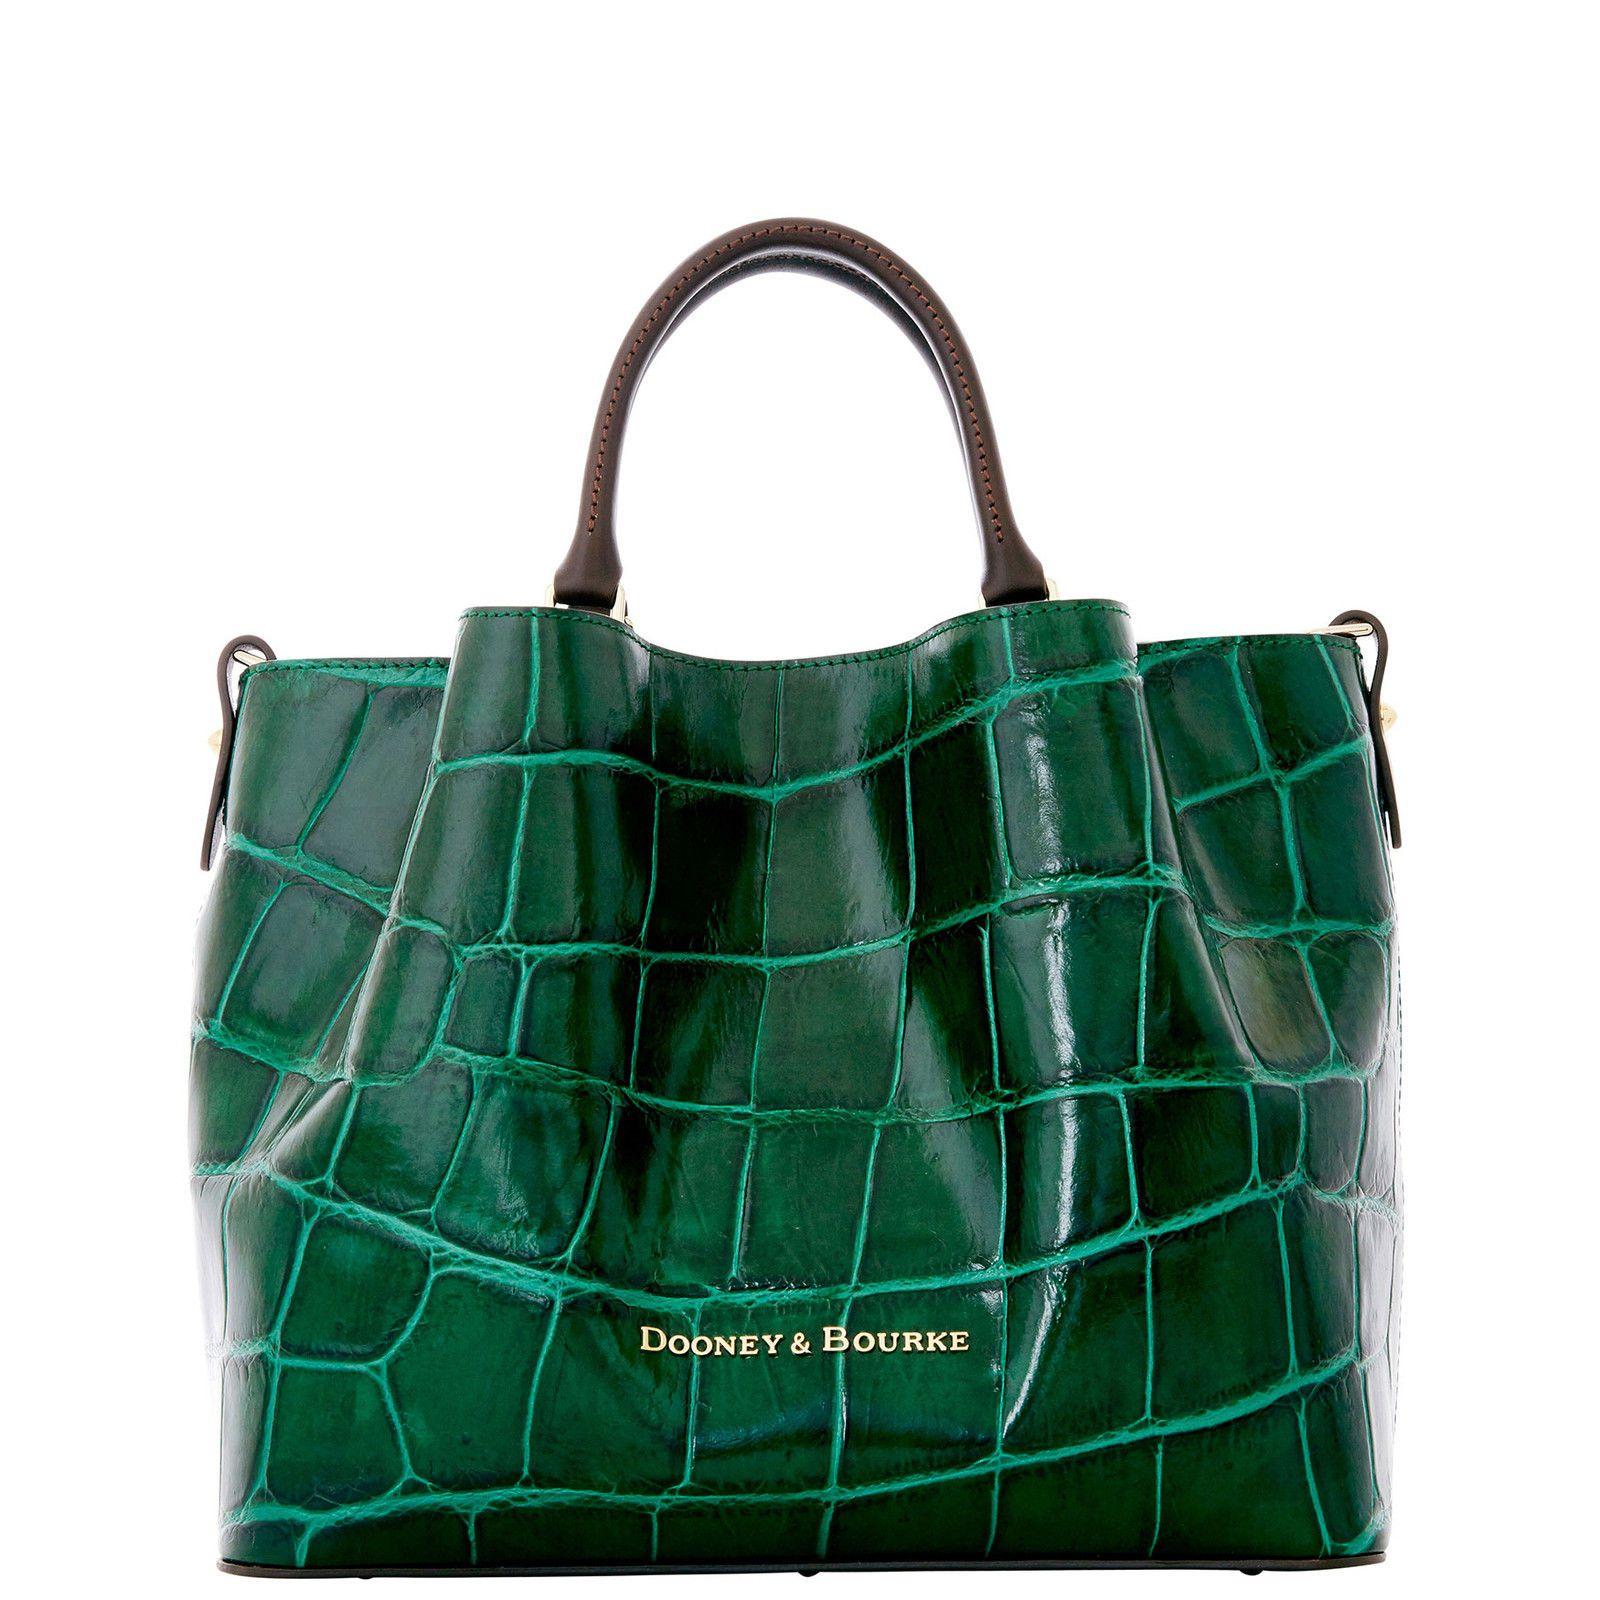 Trendy Handbags Dooney Bourke City Croco Large Barlow Ilovedooney Hangbags Ons Super Por Reiss